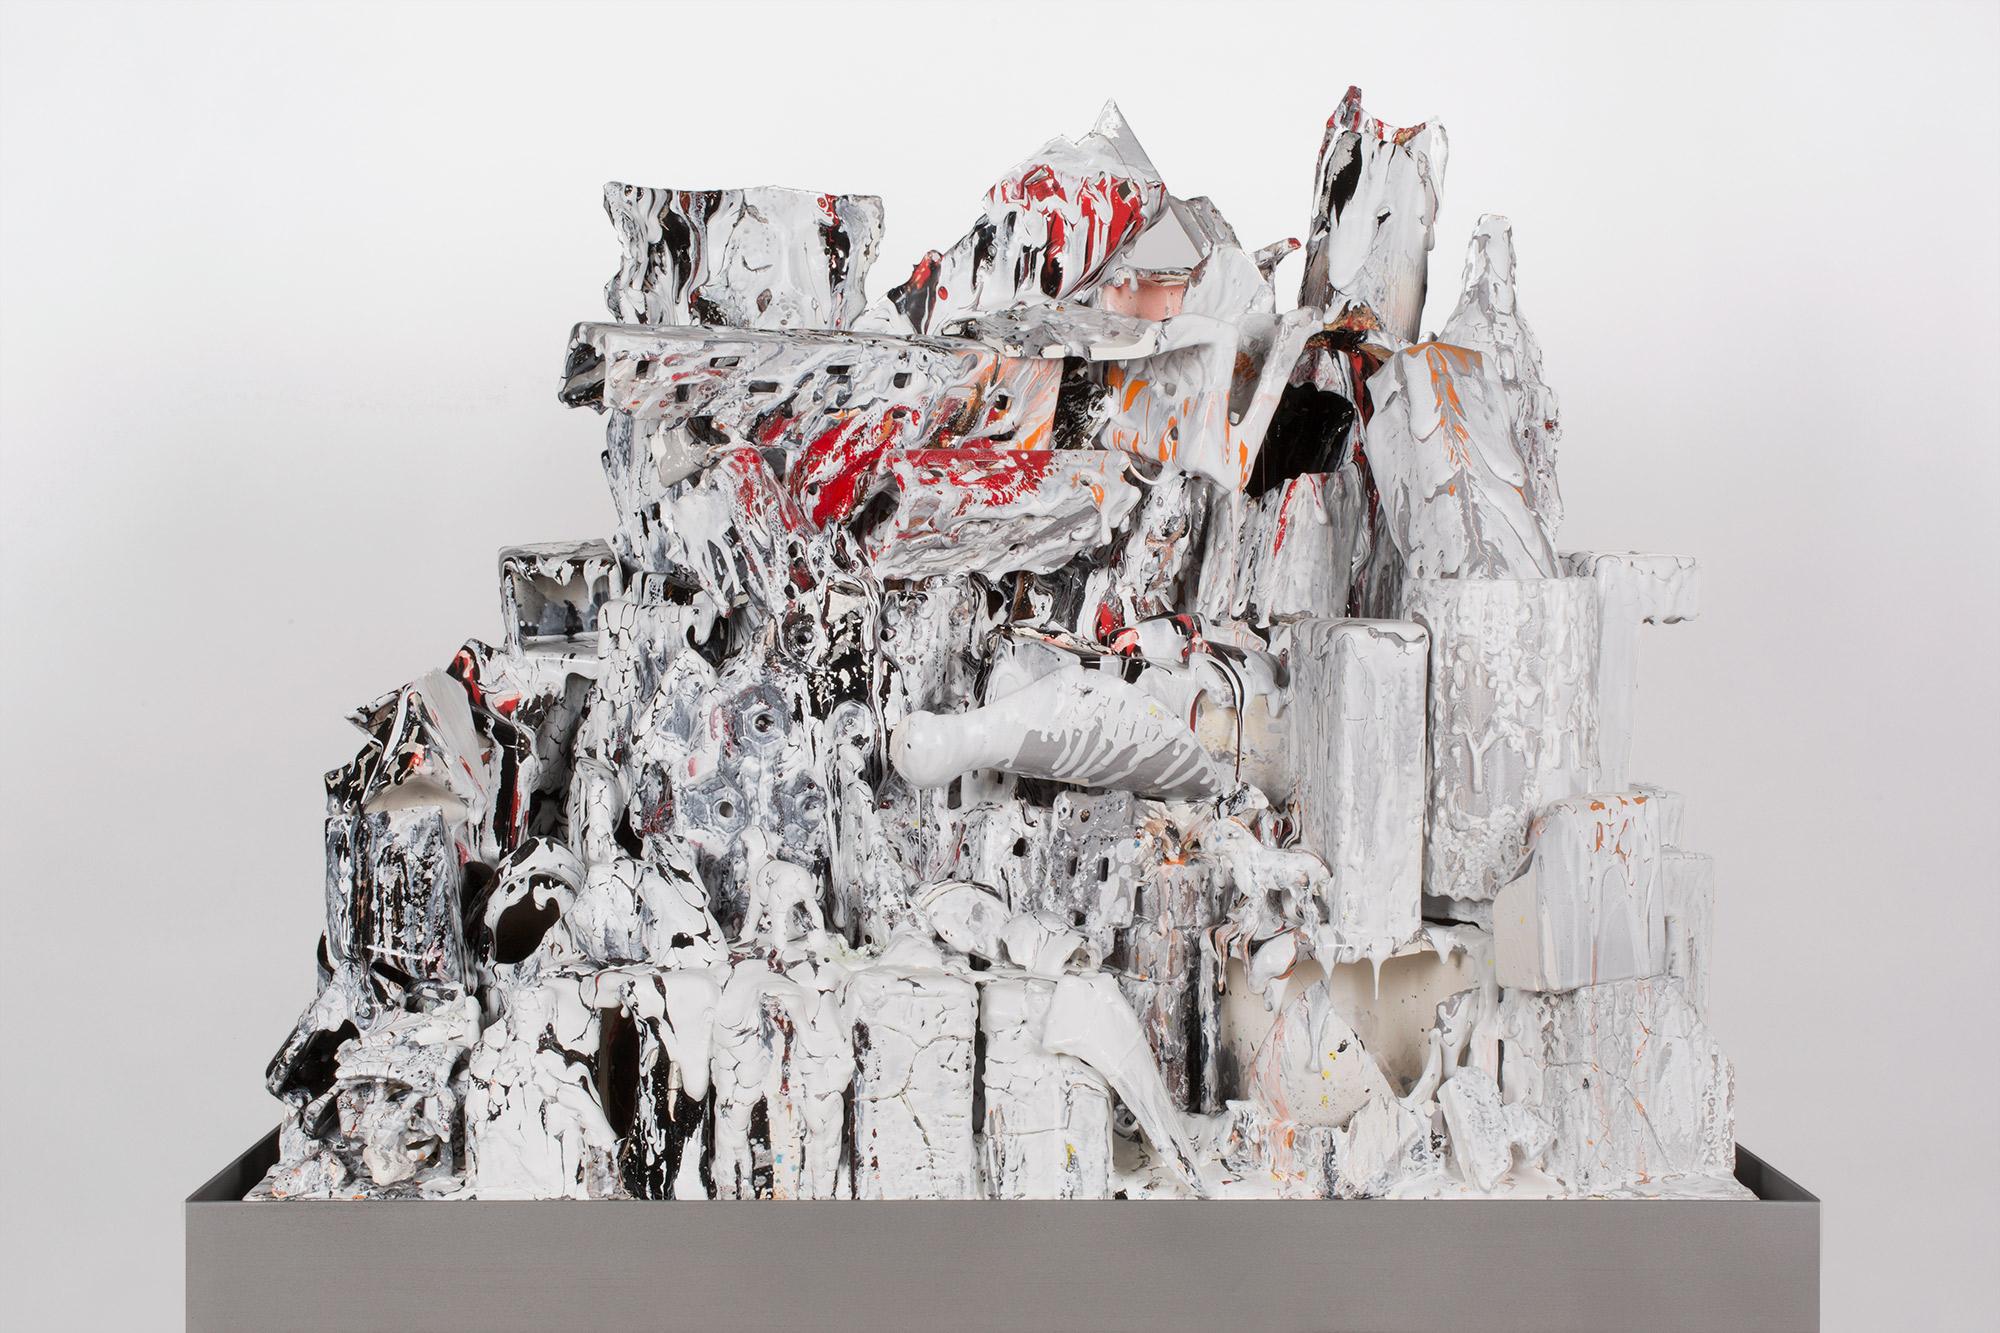 La Ciudad en Llamas (February 17–March 1, 2015: Cerámica Suro Contemporánea, Guadalajara, Jalisco, Mexico)    2015   Ceramica Suro slip cast remnants, glaze, and firing plate  54 x 42 x 26 1/2 inches   Ceramics, 2013–